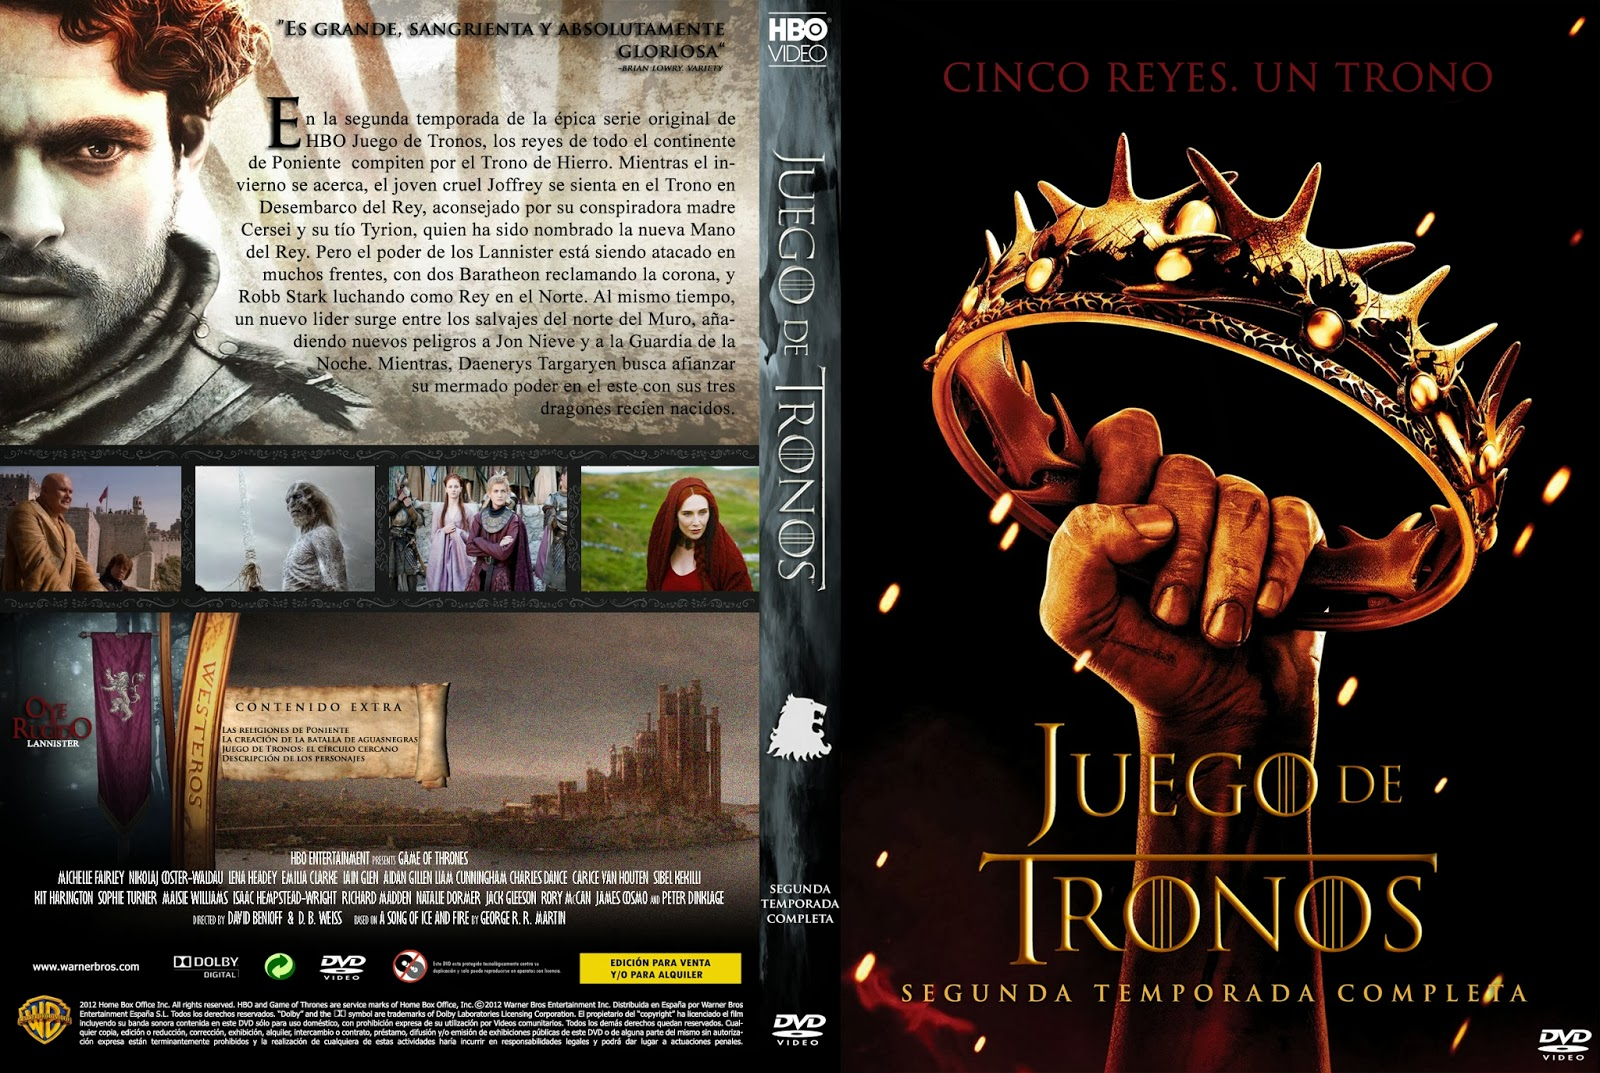 Series pepito juego tronos temporada 4 : Que paso ayer parte 3 trailer 1